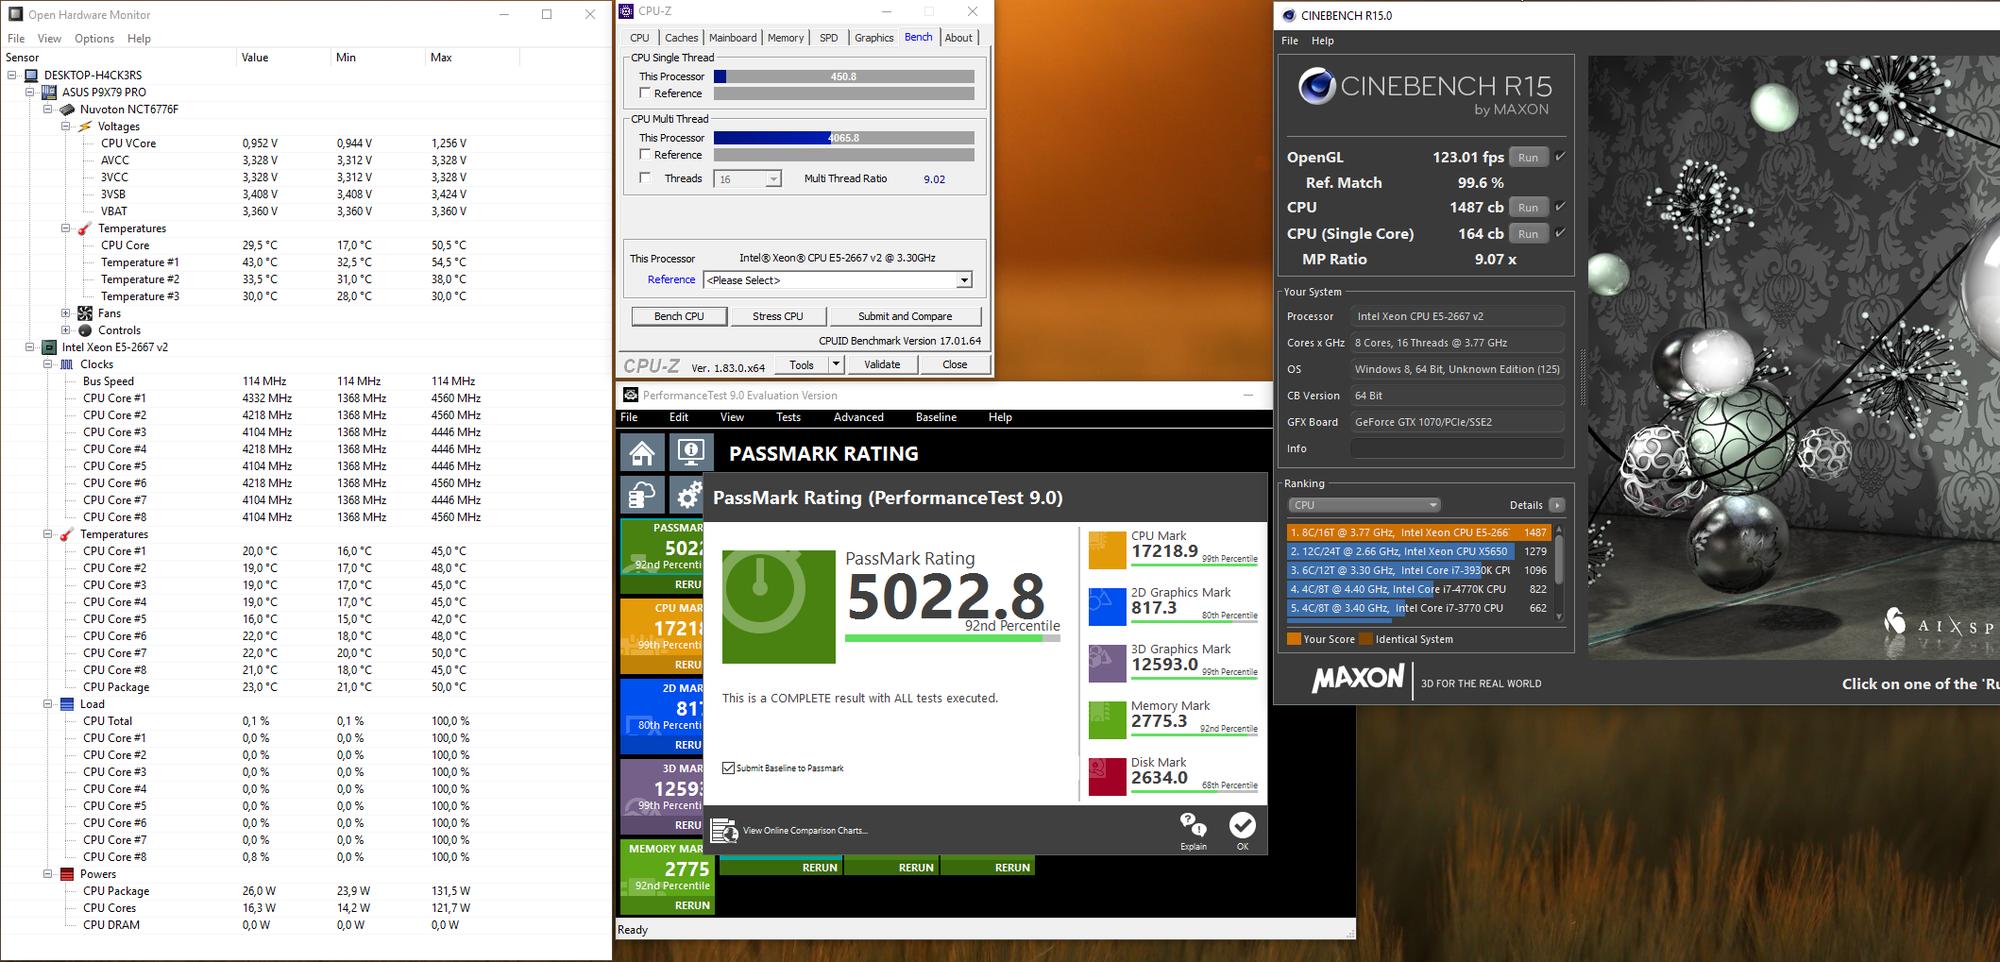 Xeon E5-2667 v2 - 4 1ghz all 8 core turbo, 4 5ghz single - 114mhz